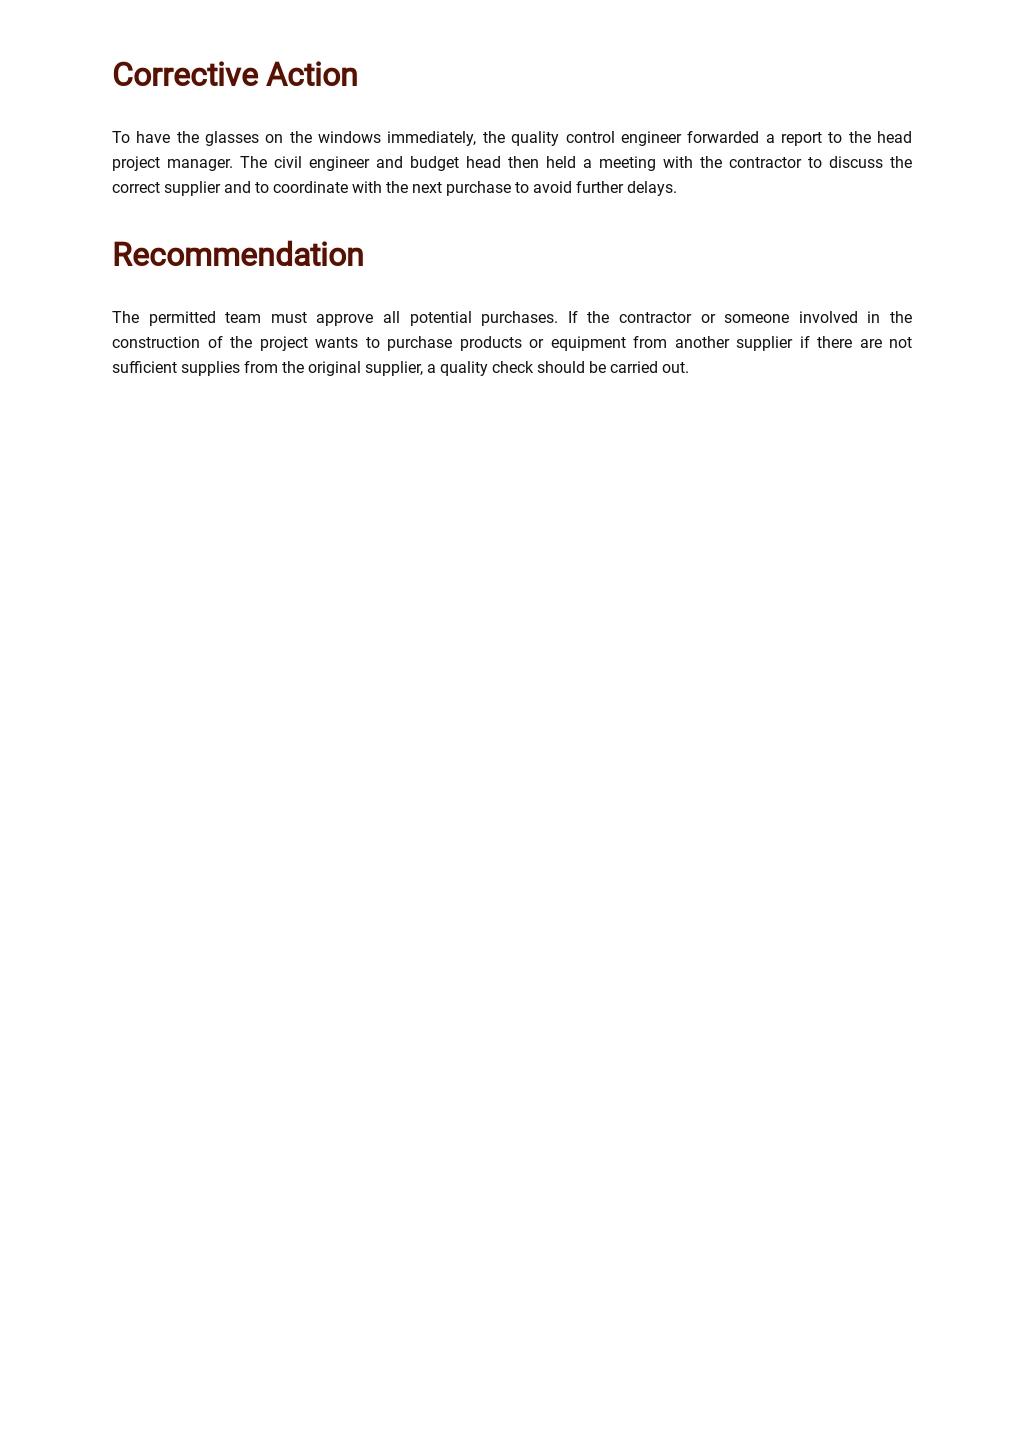 Free Product Non Conformance Report Template 2.jpe